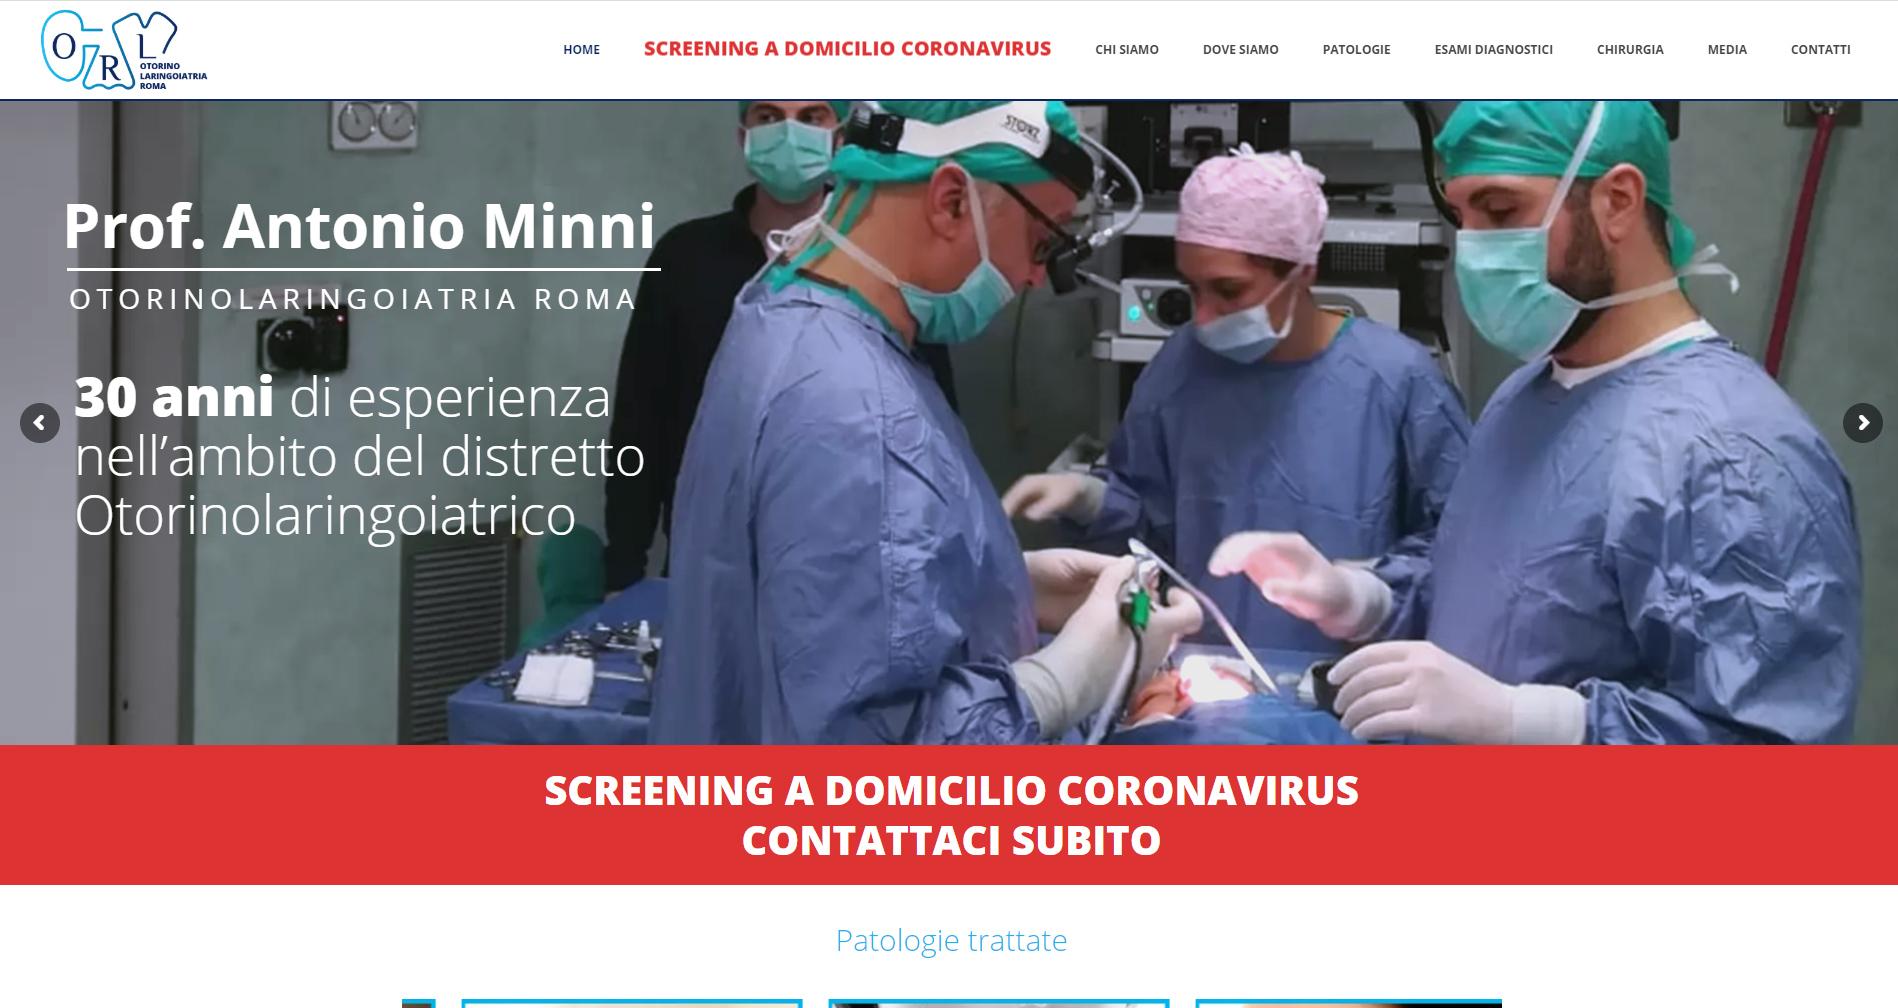 Otorinolaringoiatriaroma.com - Antonio Minni - Gianluca De Bianchi - Jeanzilla